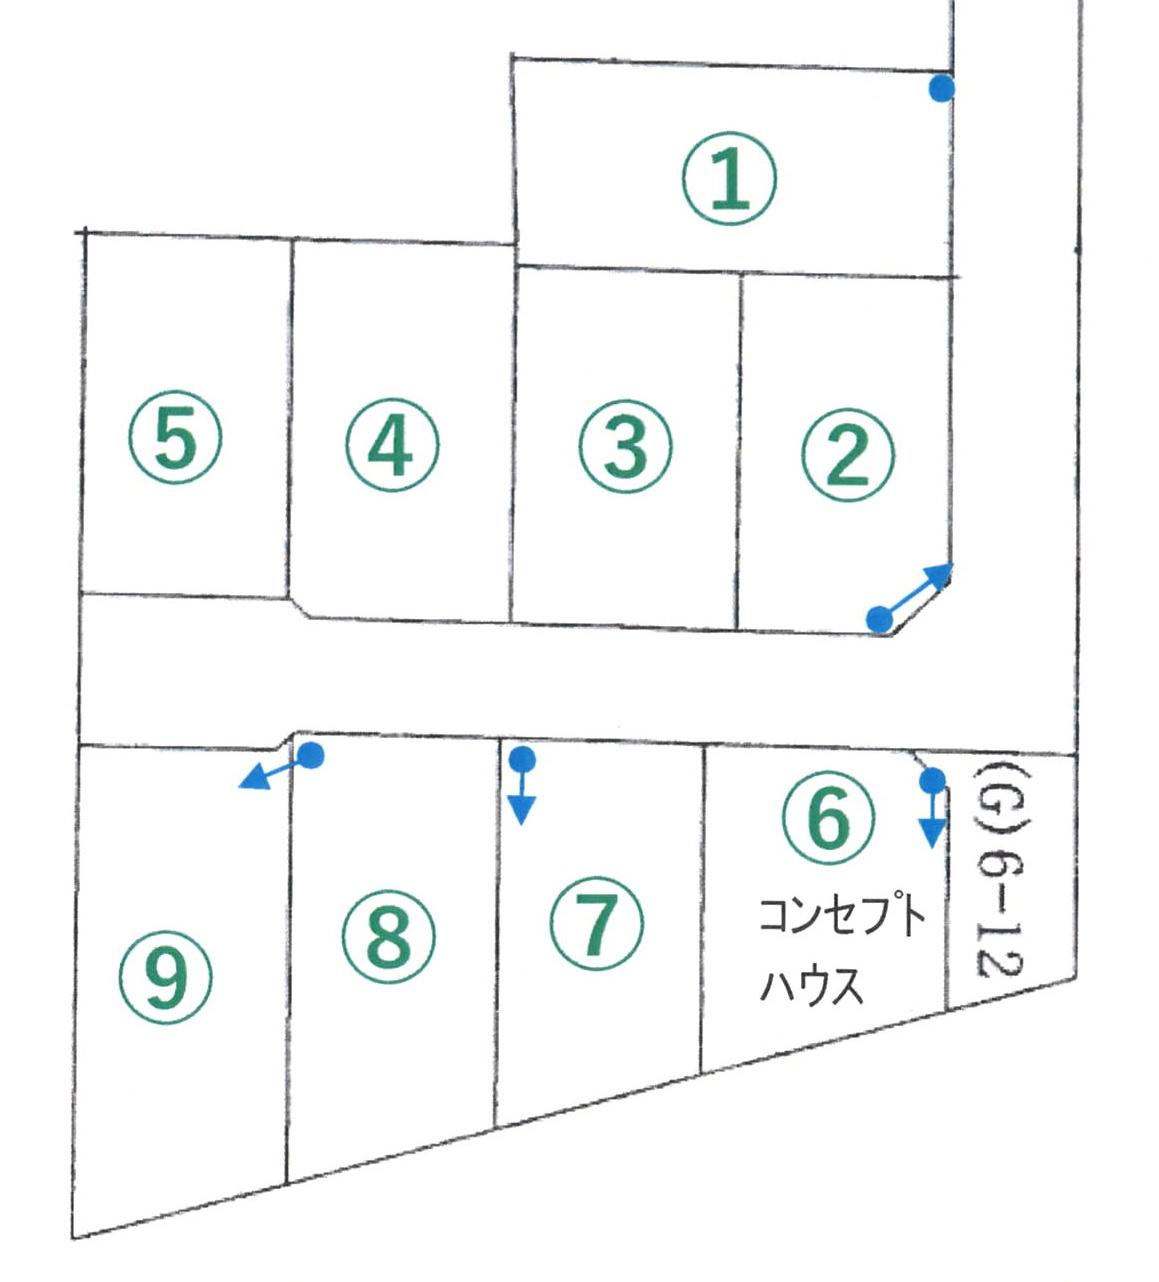 (№1・№2・№6・№7・№8・№9)